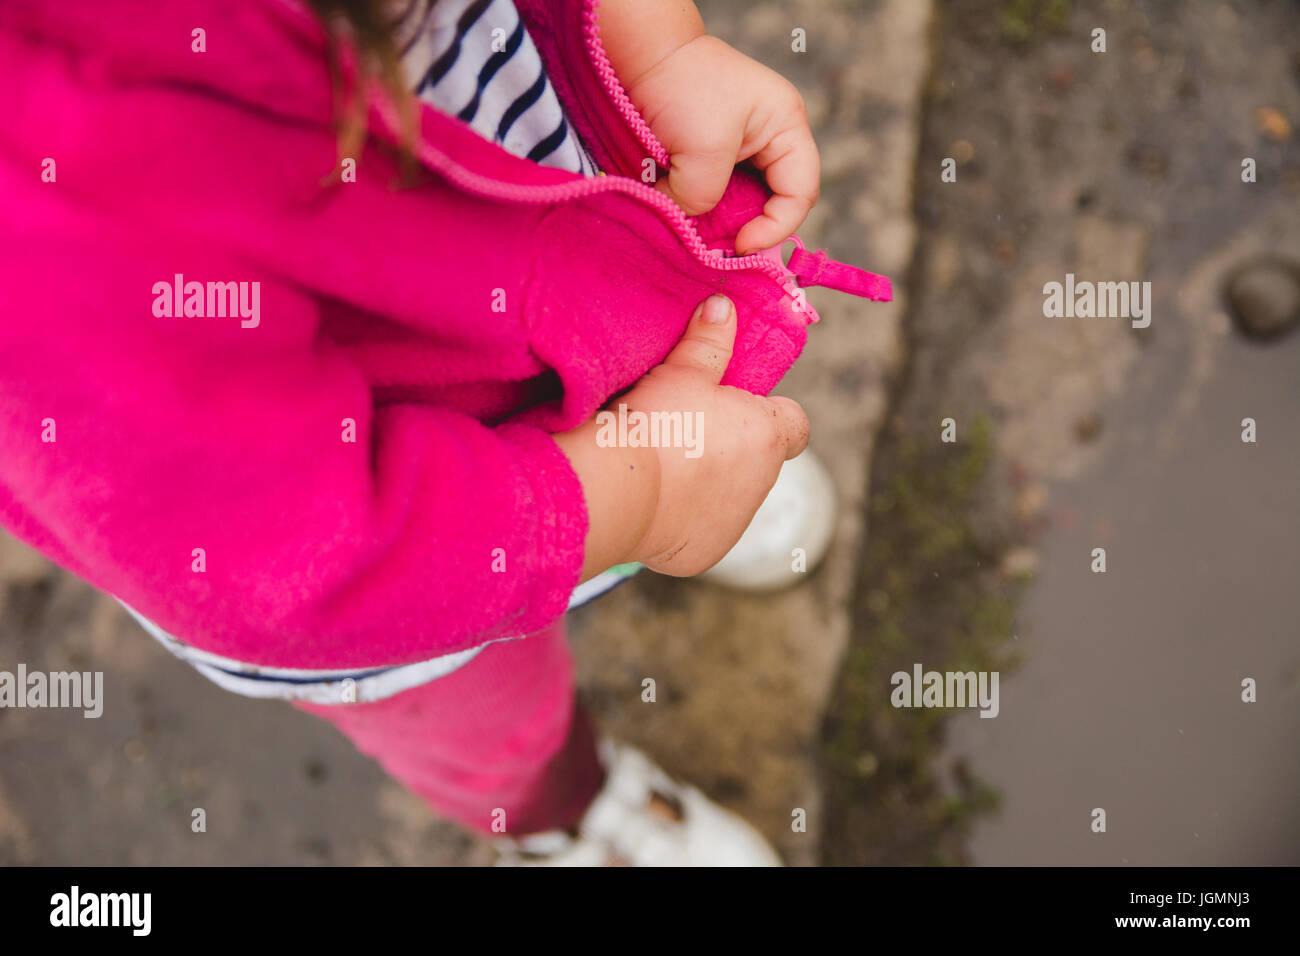 Un bambin zipping son blouson mains seulement. Photo Stock